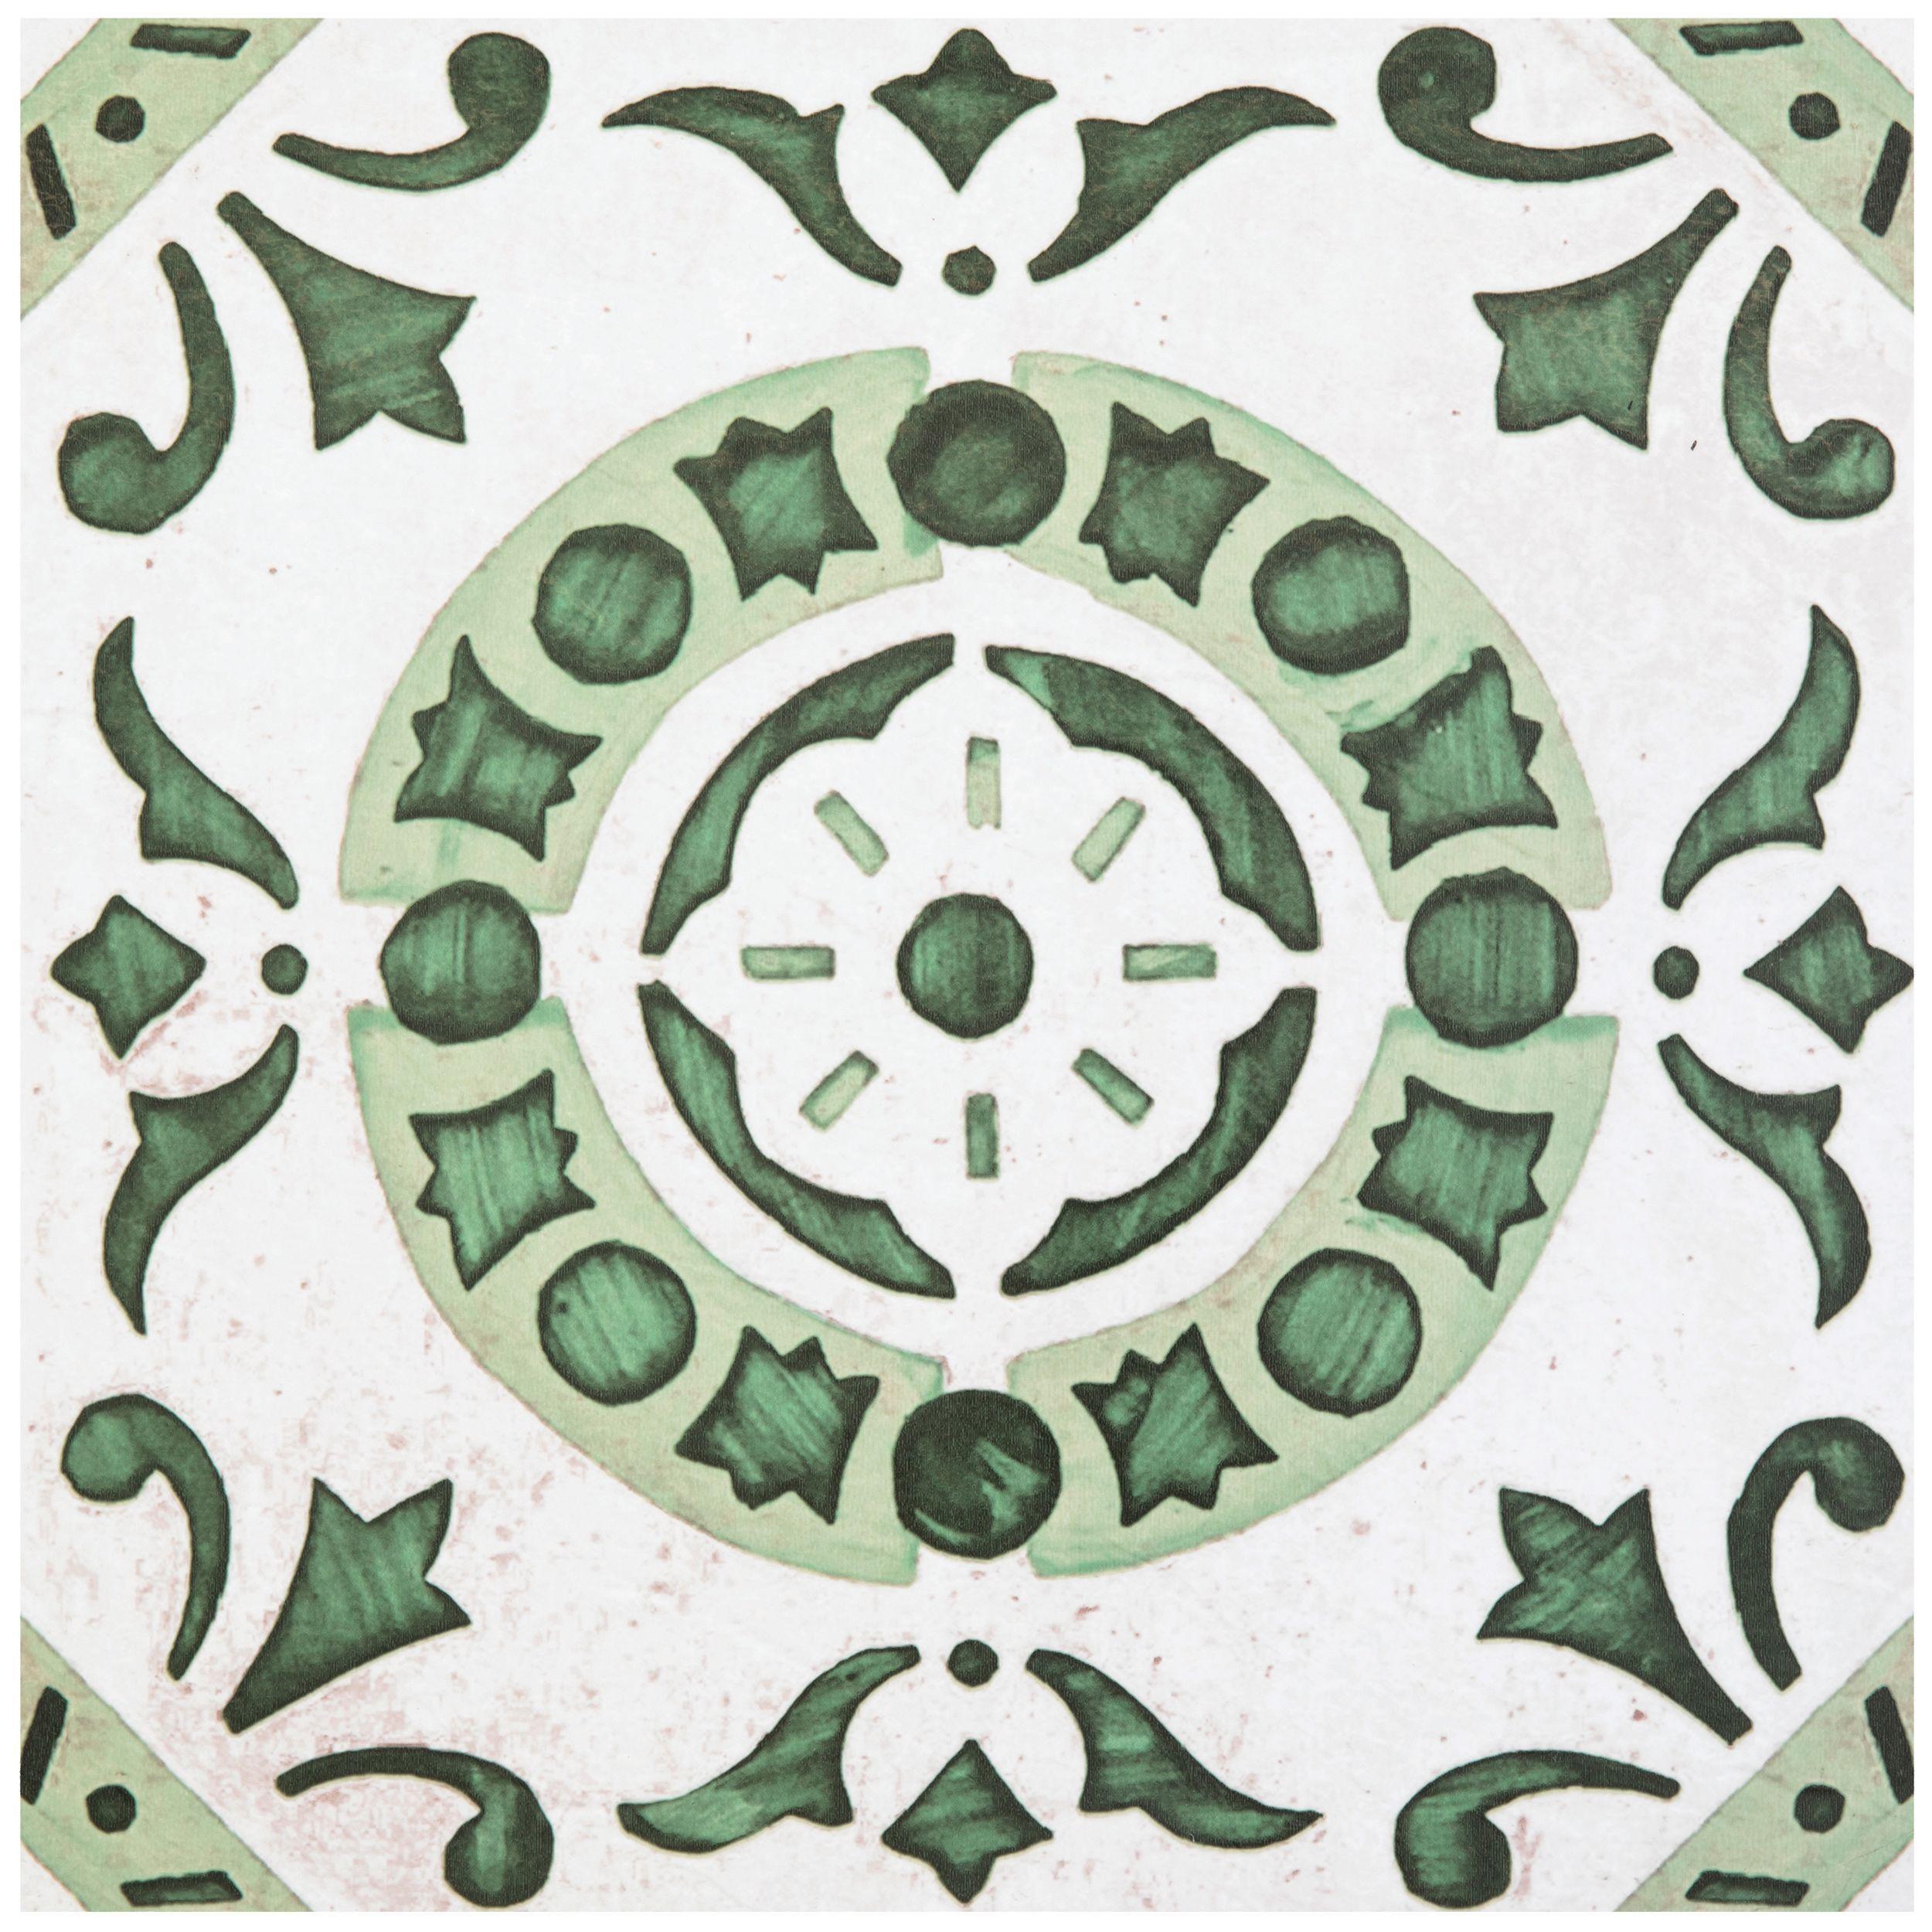 Achim Retro Self Adhesive Vinyl Floor Tile 20 Tiles 20 Sq Ft 12 X 12 Green Medallion Walmart Com In 2020 Vinyl Flooring Peel And Stick Floor Vinyl Tile